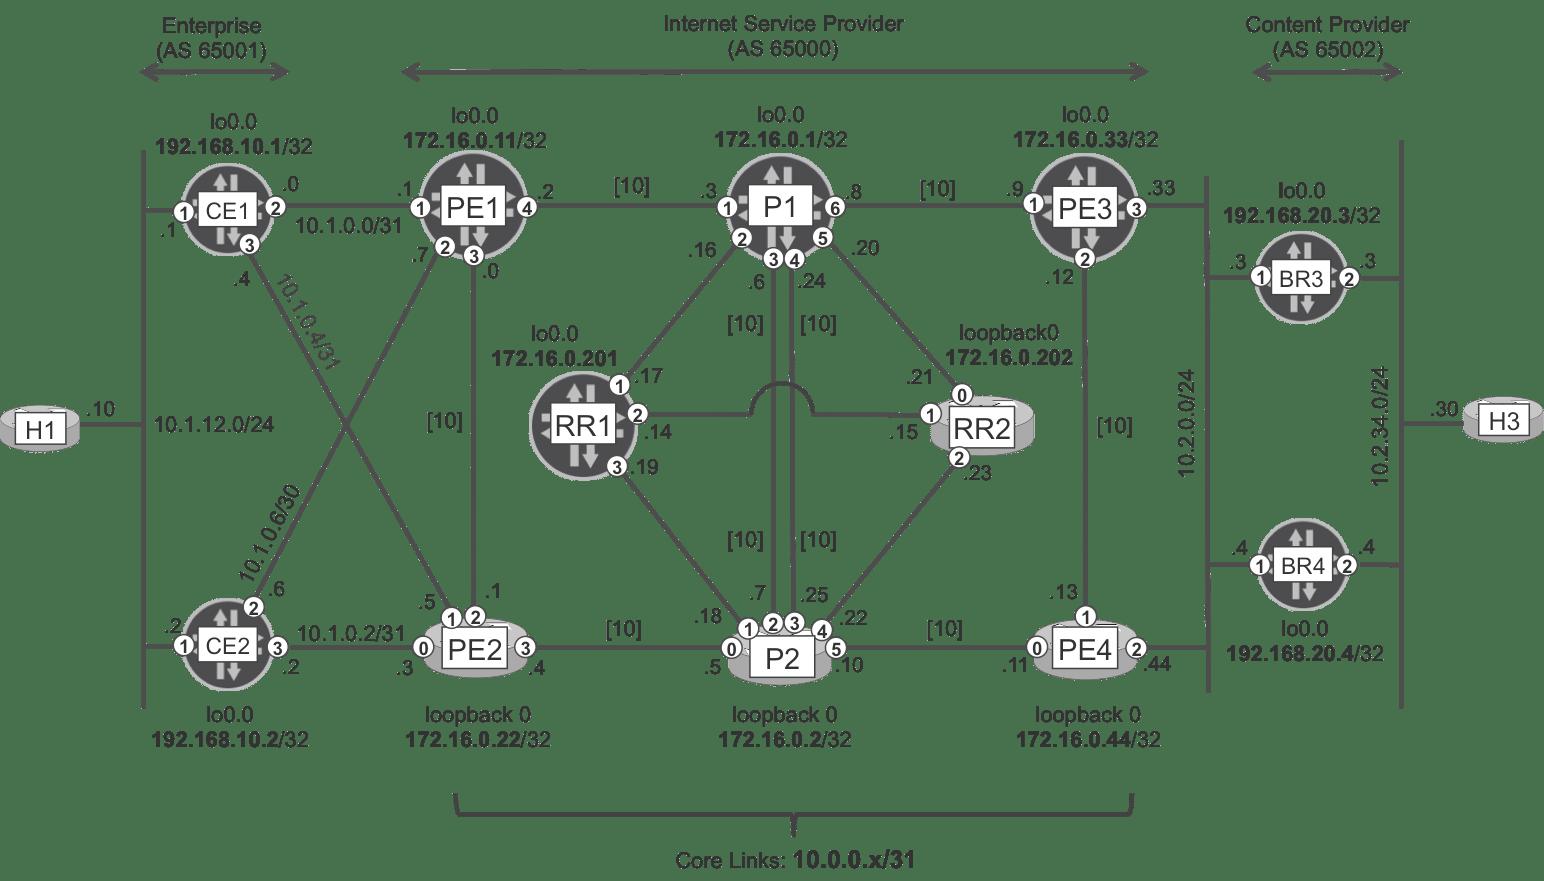 Internet Baseline Without Mpls